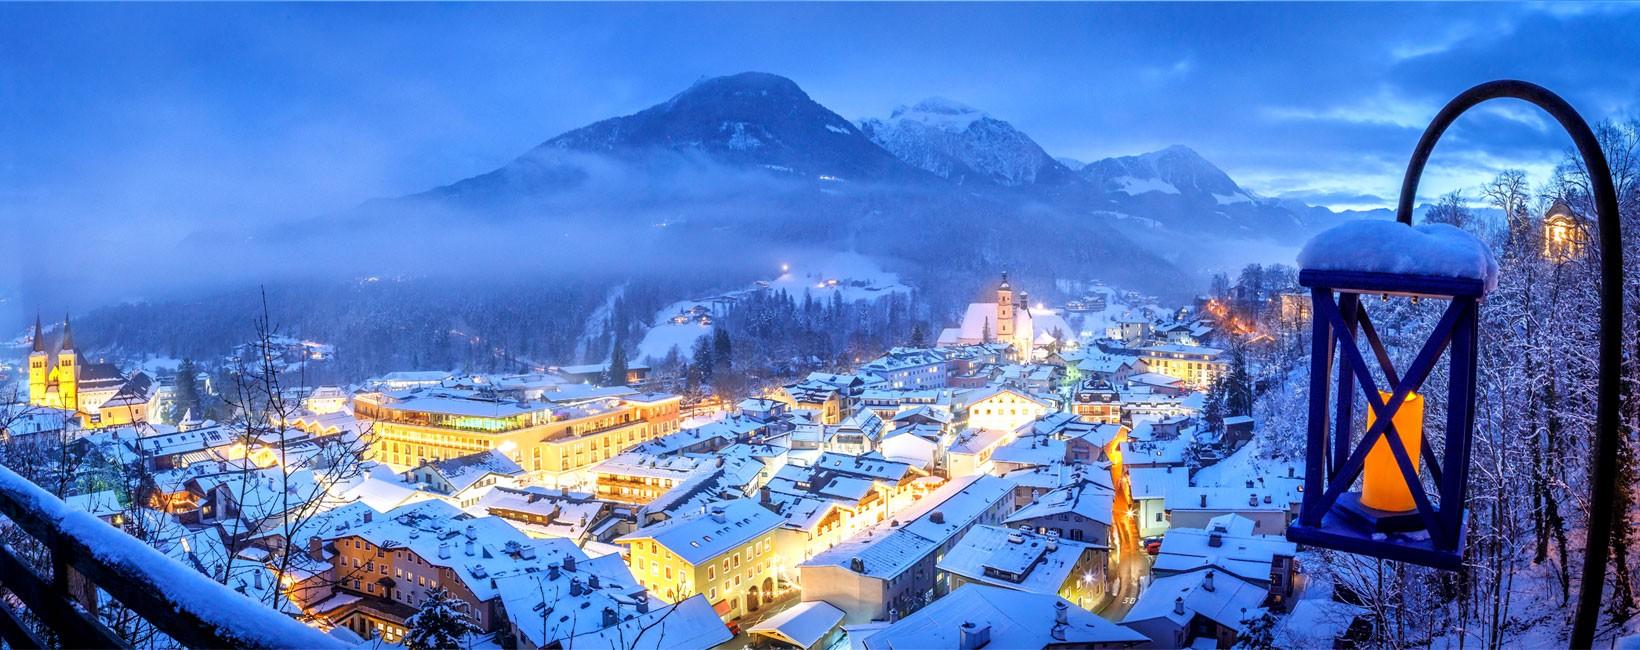 Unterkünfte in Berchtesgaden - Winterurlaub